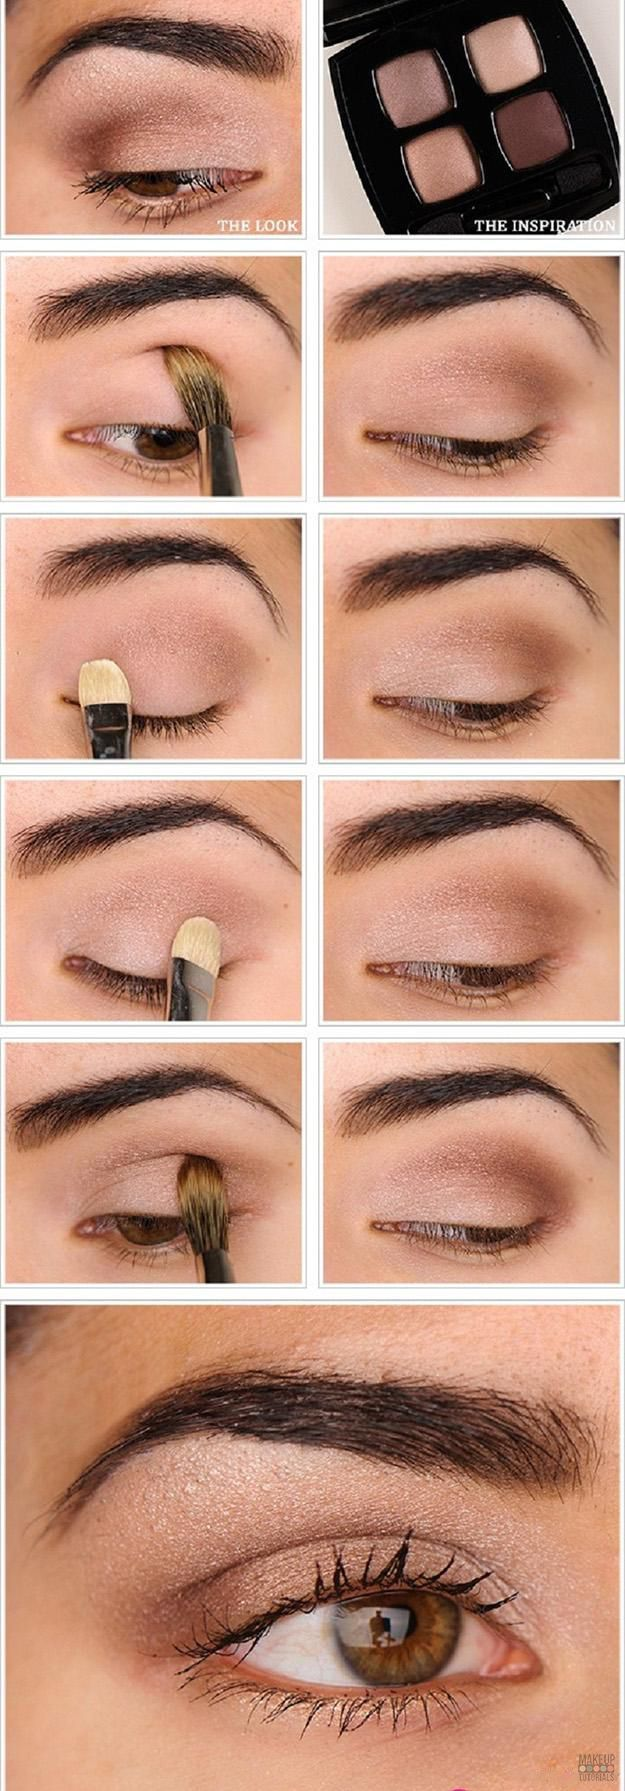 Eyeshadow Tutorials: Everyday Makeup Diy Tutorial For Natural Look, Perfect  Makeup For Brown